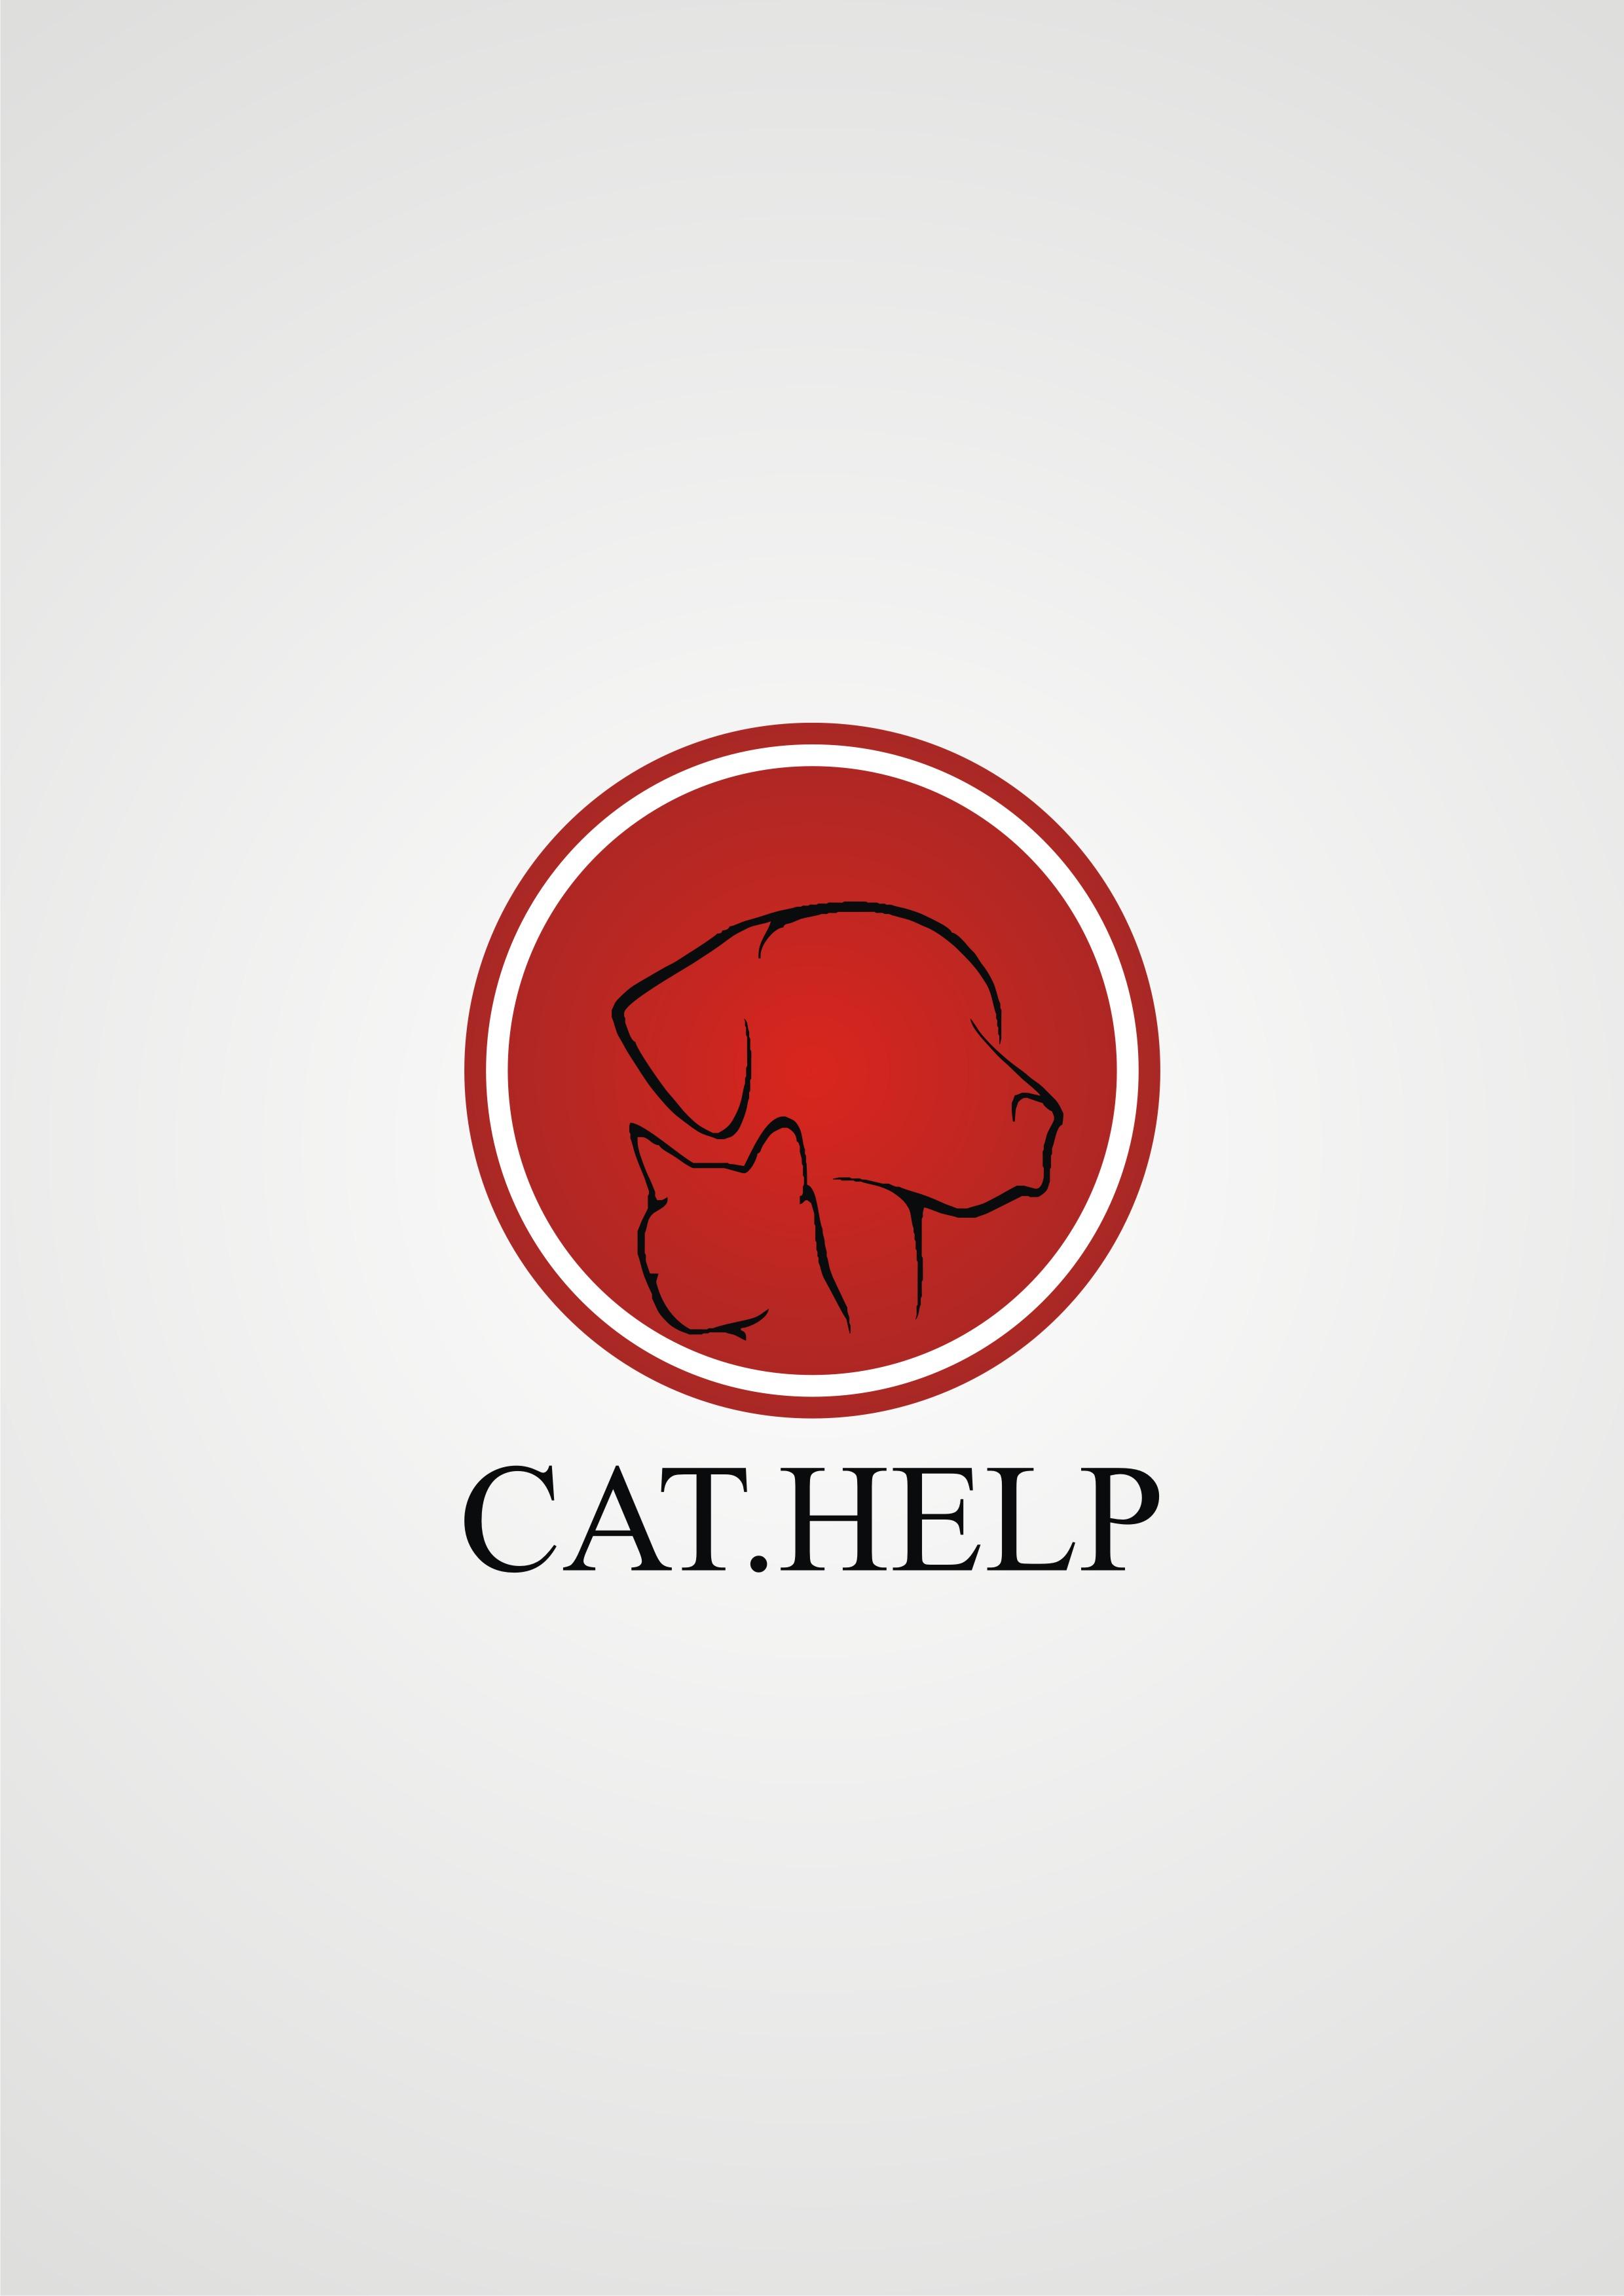 логотип для сайта и группы вк - cat.help фото f_97059dd92a0e305c.jpg